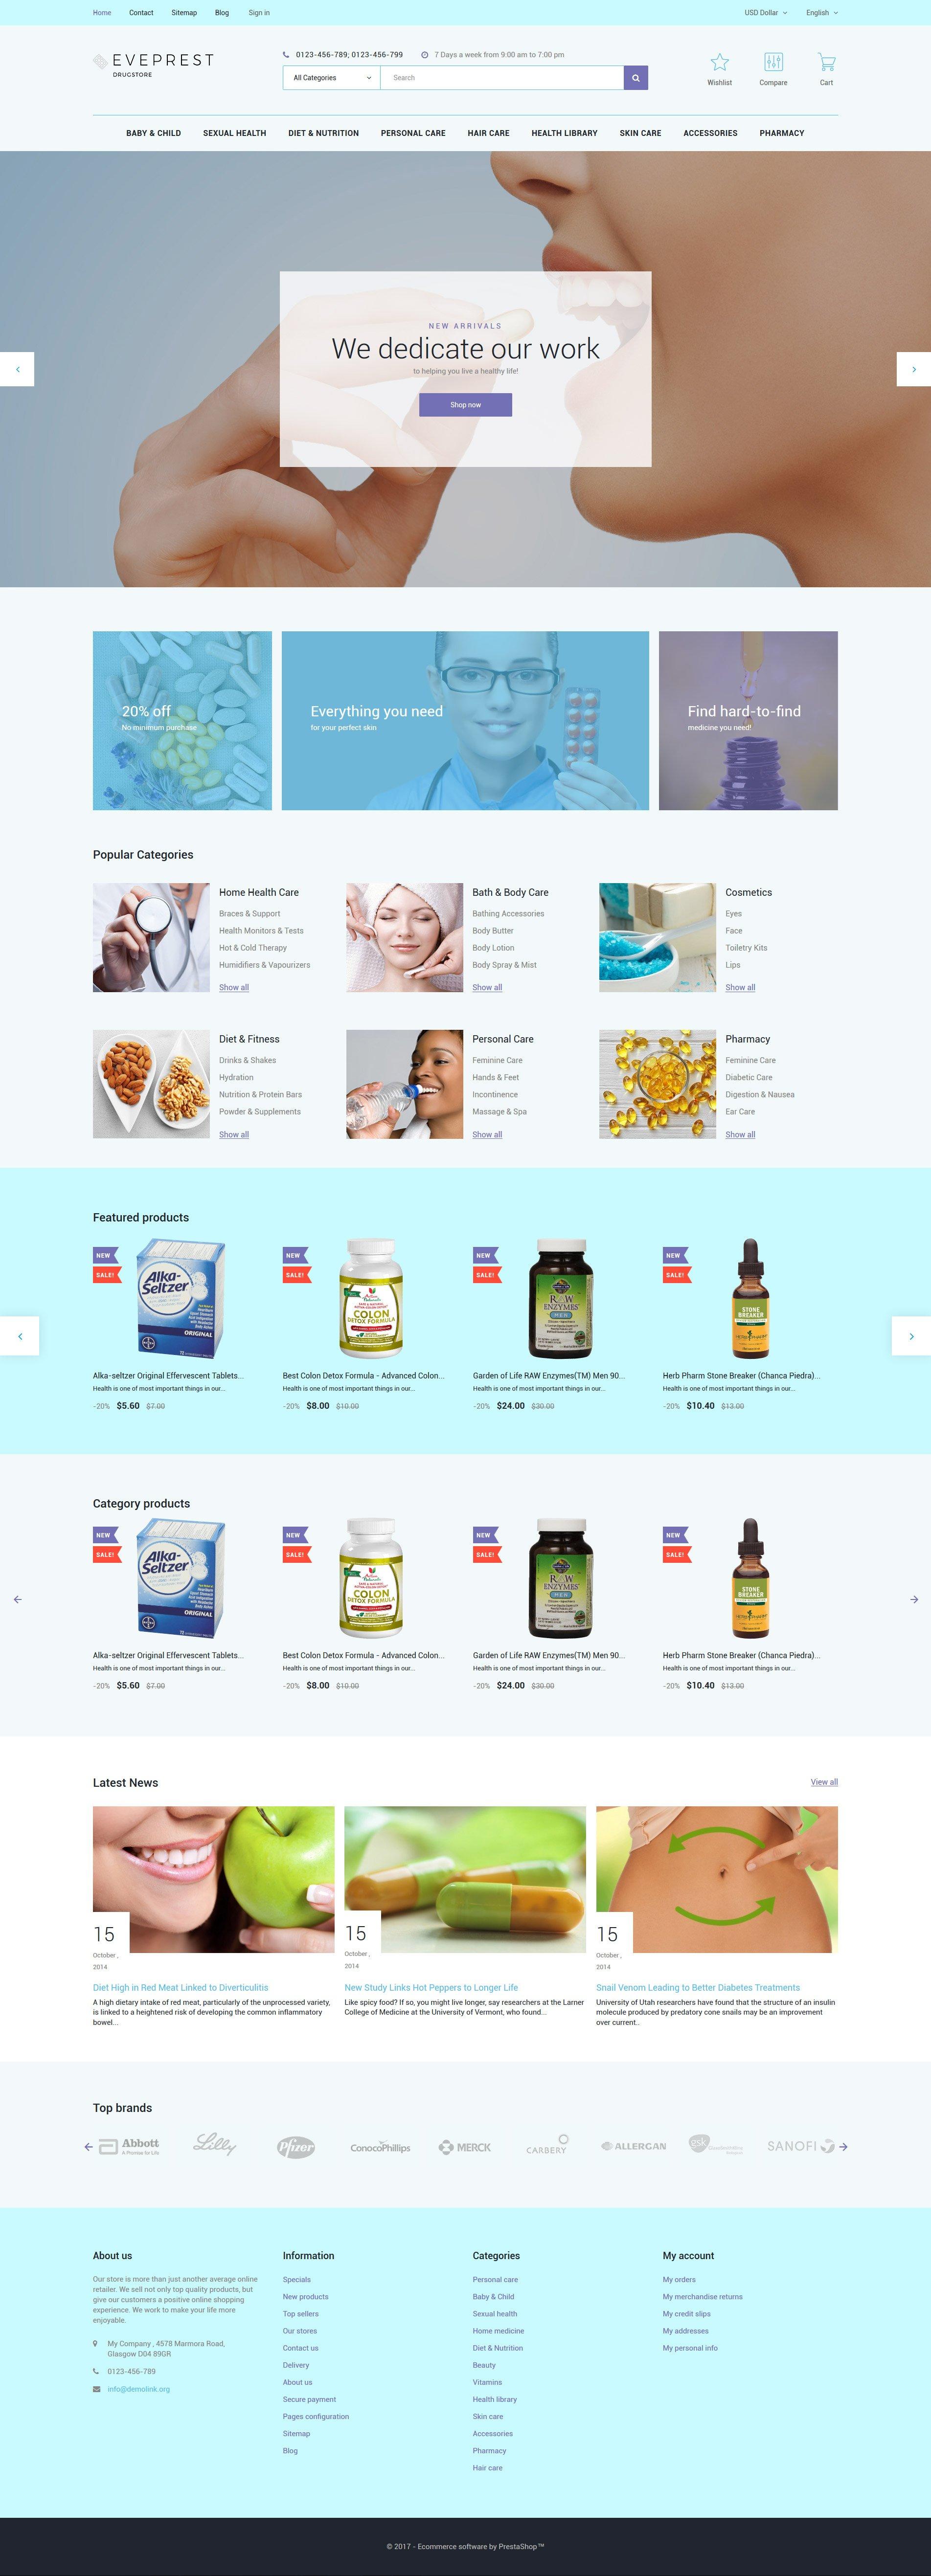 Responsive Eveprest - Drugstore Prestashop #62336 - Ekran resmi